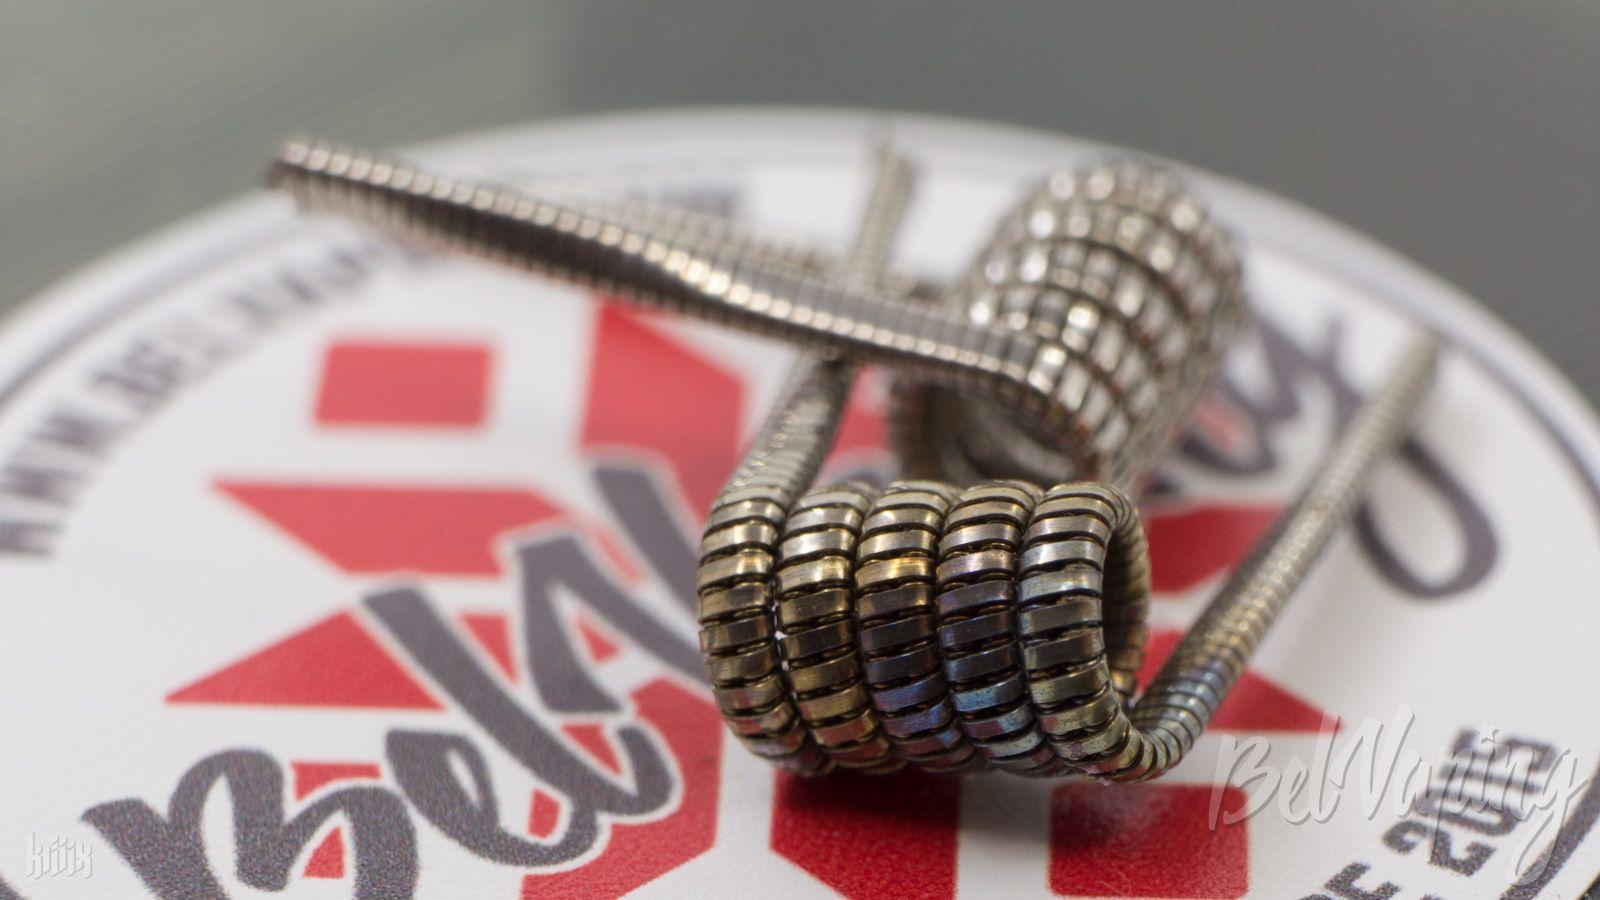 Тип спирали: Juggernaut Clapton Coil (джаггернаут коил)